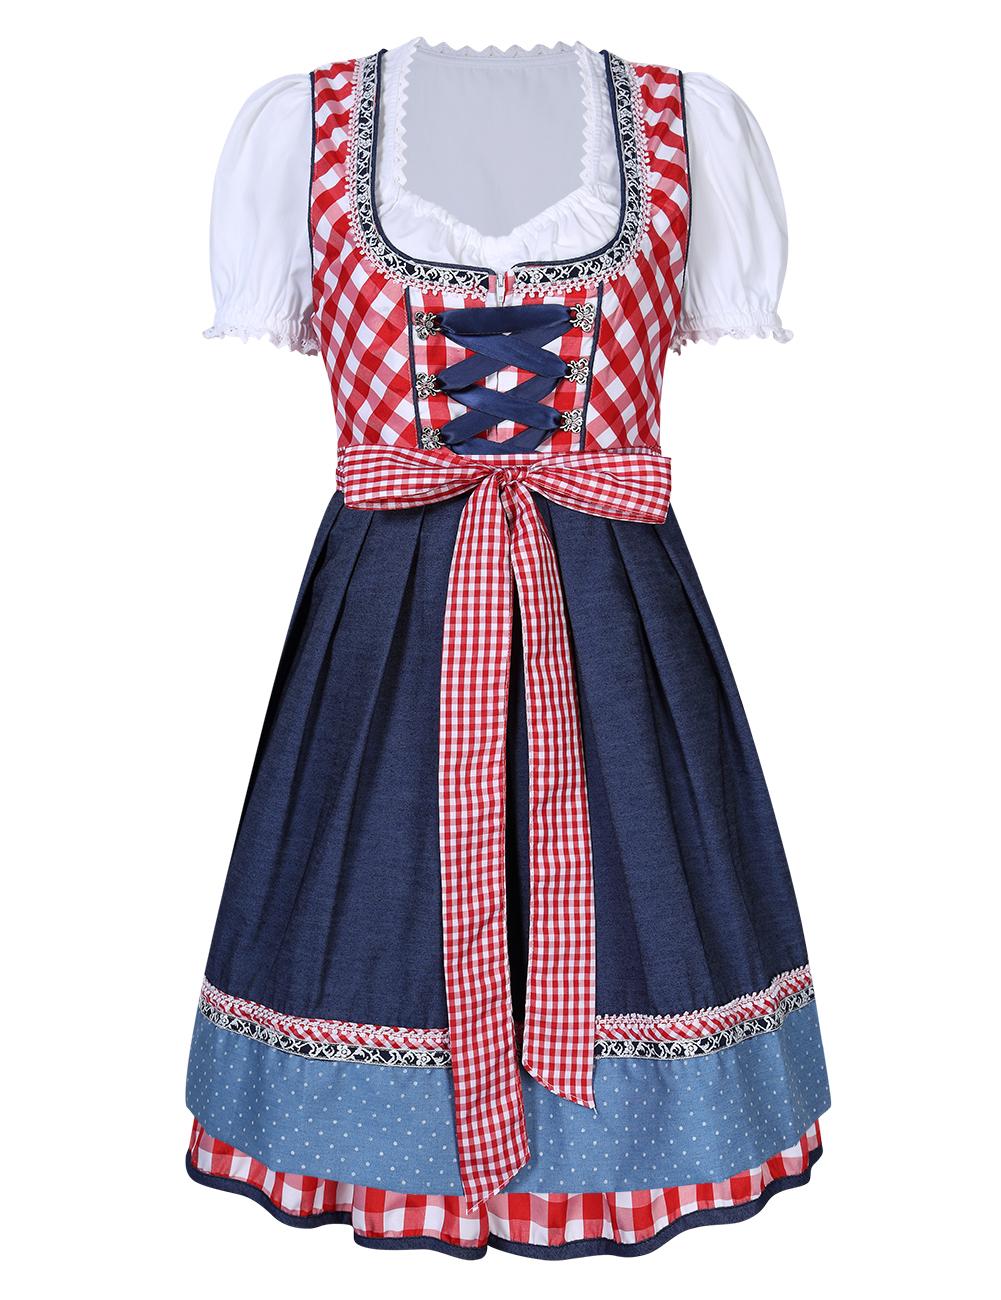 [EU Direct] Kojooin Women's German Dirndl Dress 3 Pieces Oktoberfest Costumes Red_Red plaid